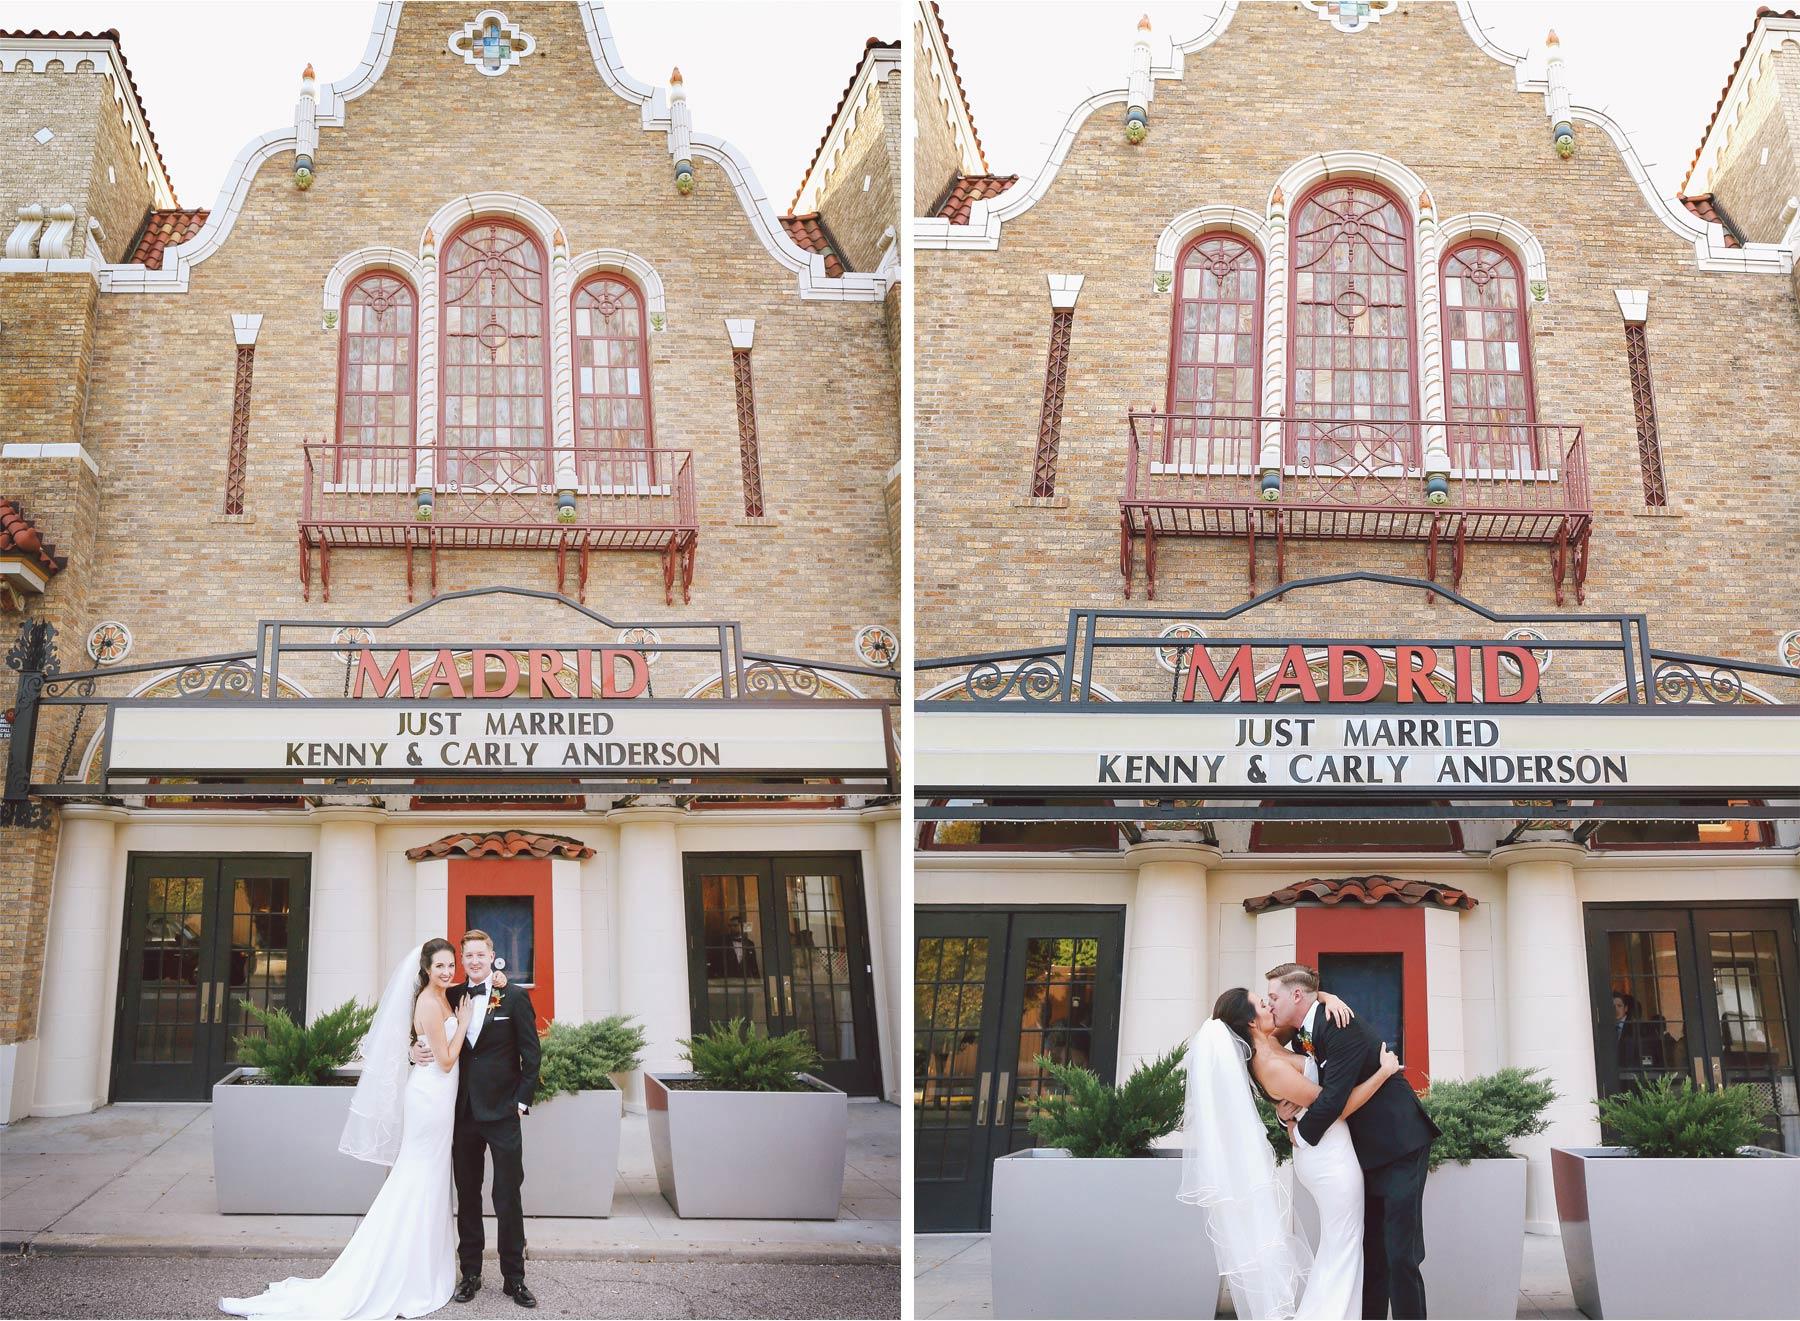 18-Kansas-City-Missouri-Destination-Wedding-Photography-by-Vick-Photography-Madrid-Theatre-Ceremony-Carly-and-Kenny.jpg